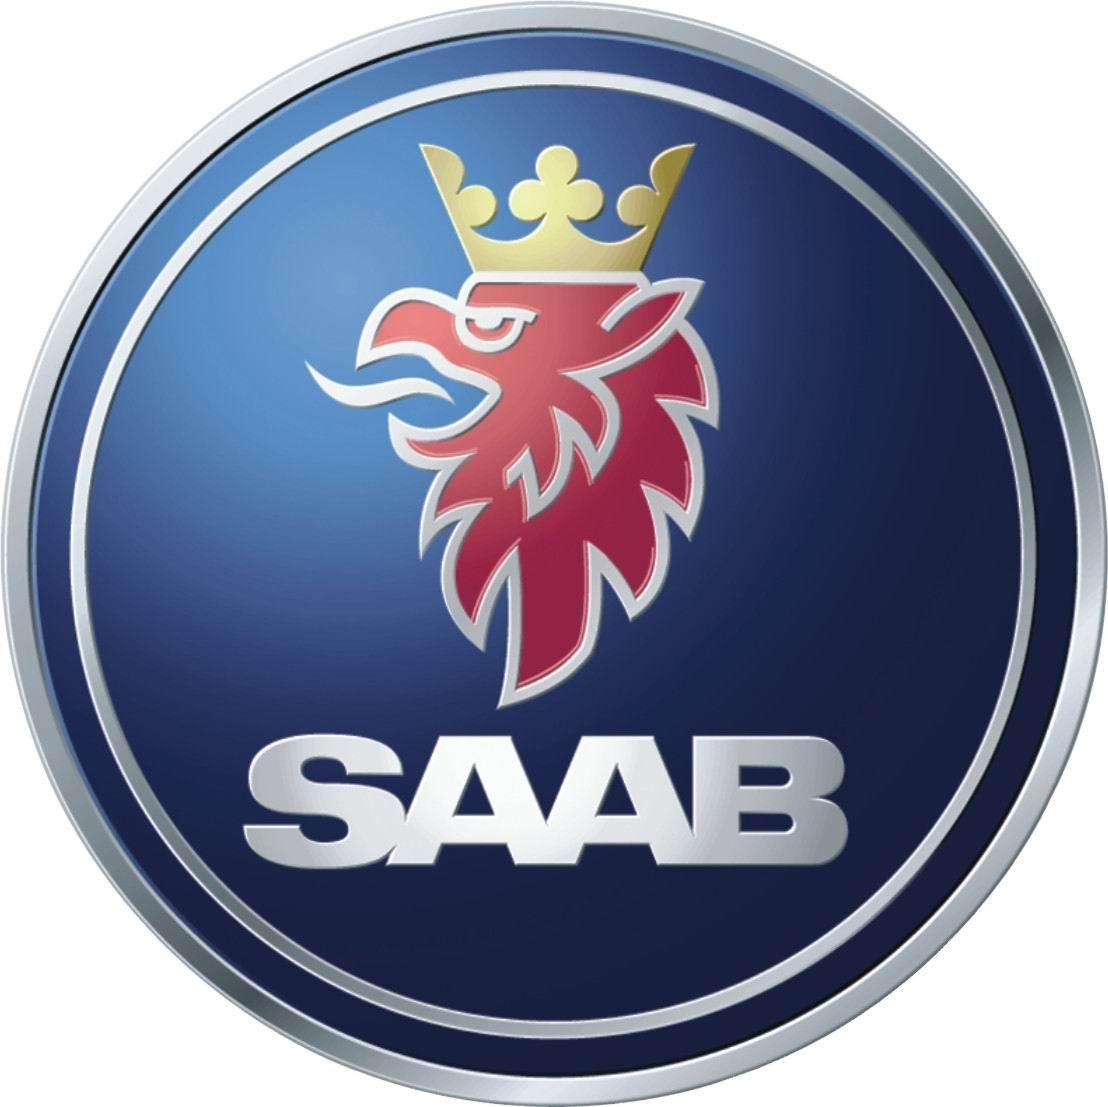 Saab car logo | brandedlogos.net | Pinterest | Car logos, Cars and ...